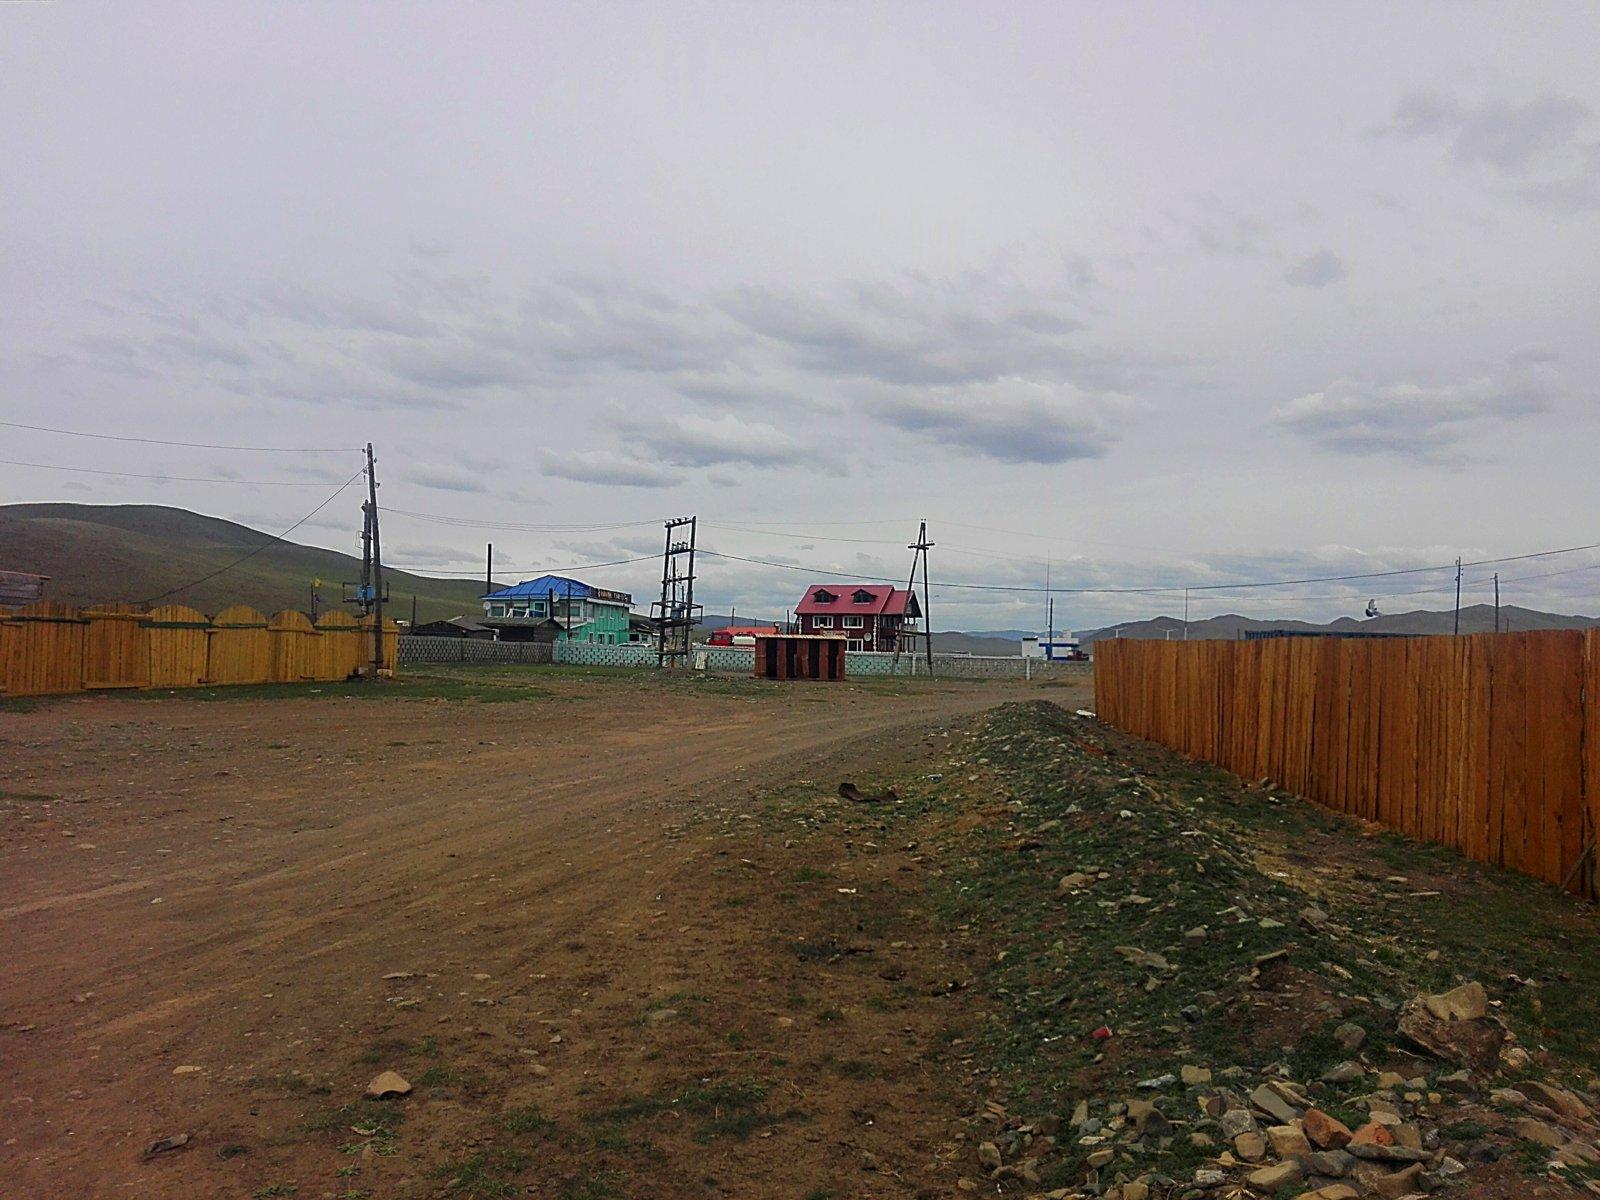 img_20160524_012549-jpg.30630_Mongolia Rainbow Horse Caravan_Travel Stories_Squat the Planet_4:14 AM